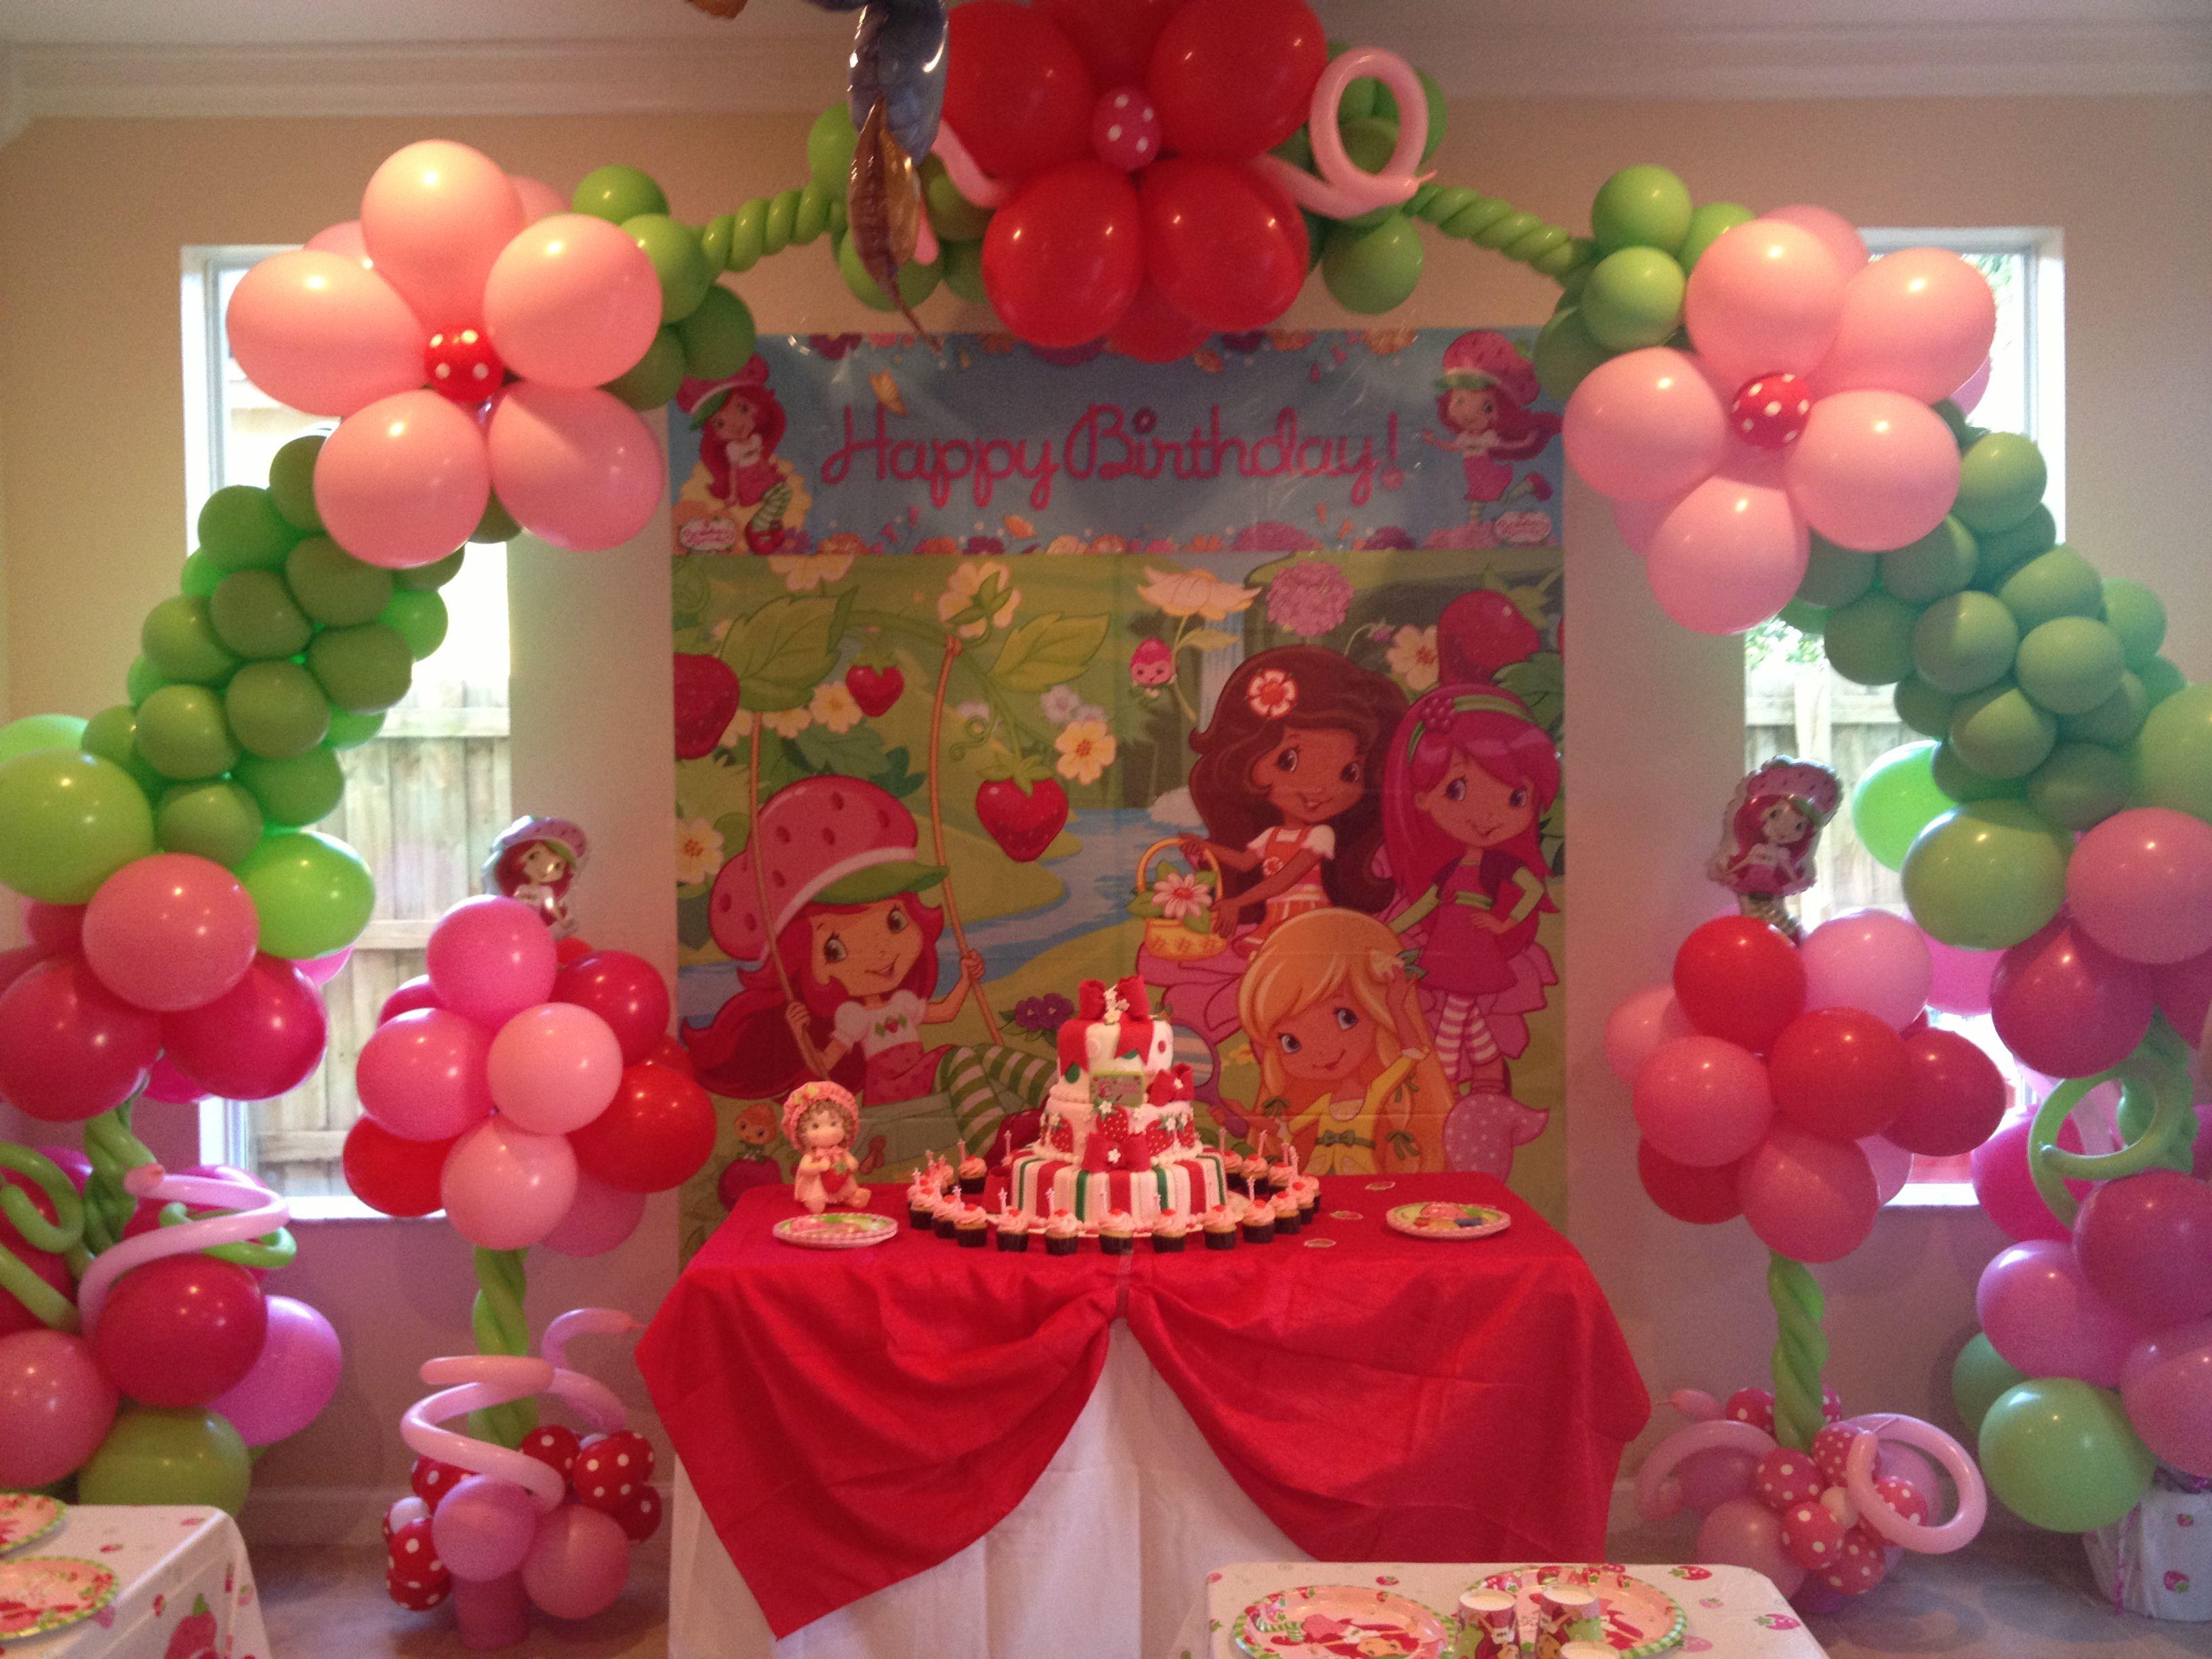 Strawberry shortcake inspired balloon arch